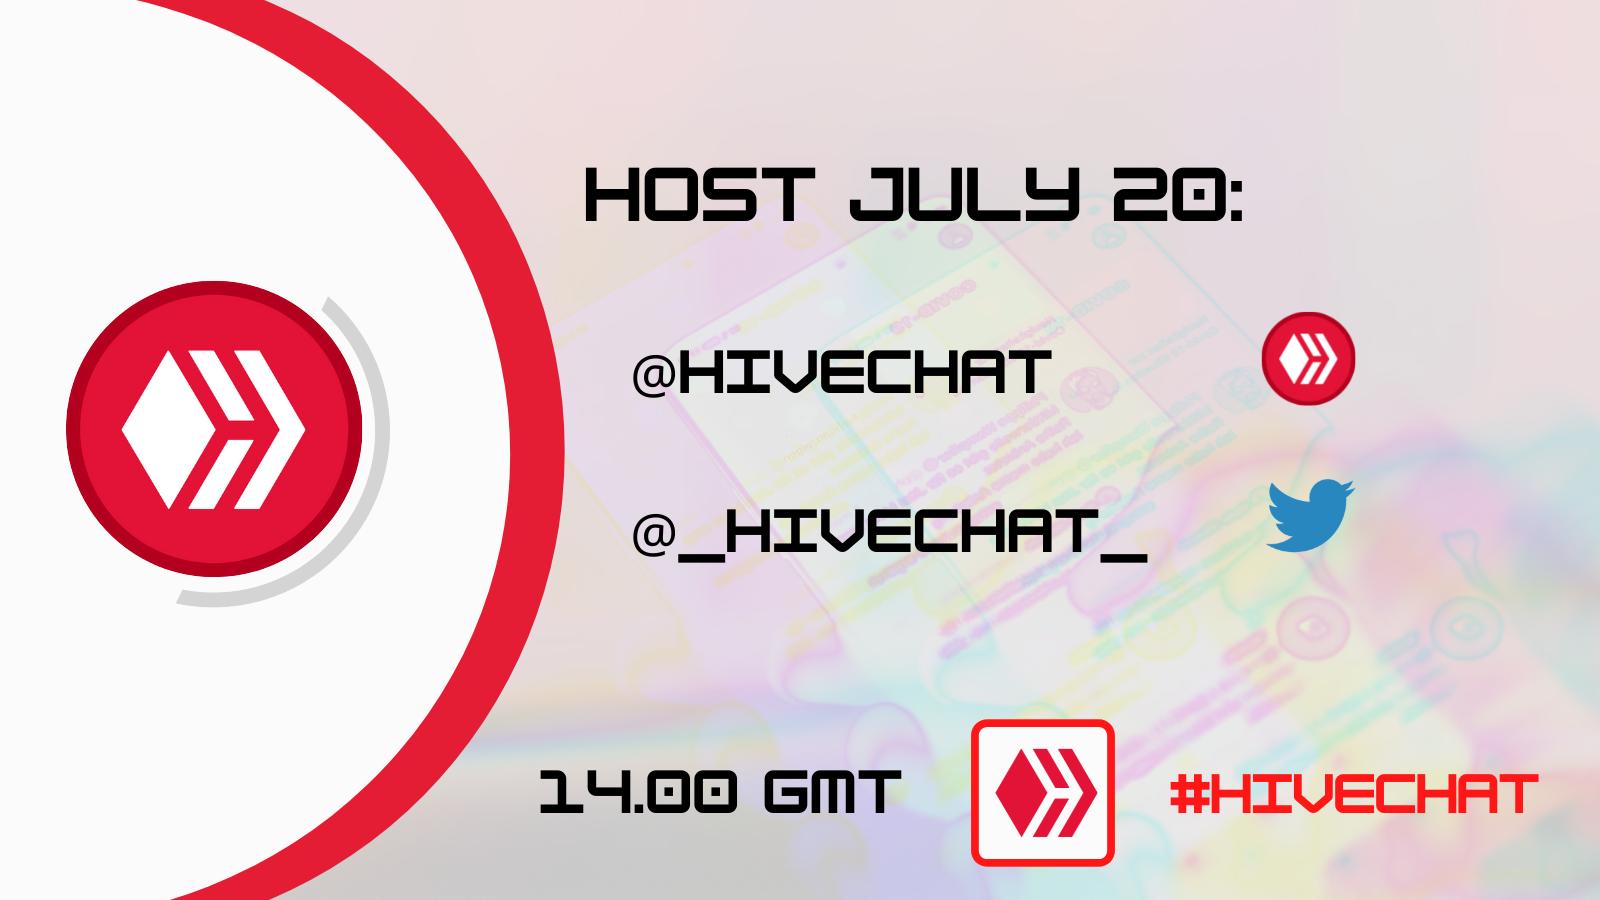 June 29 HIVECHAT announcement 1.png